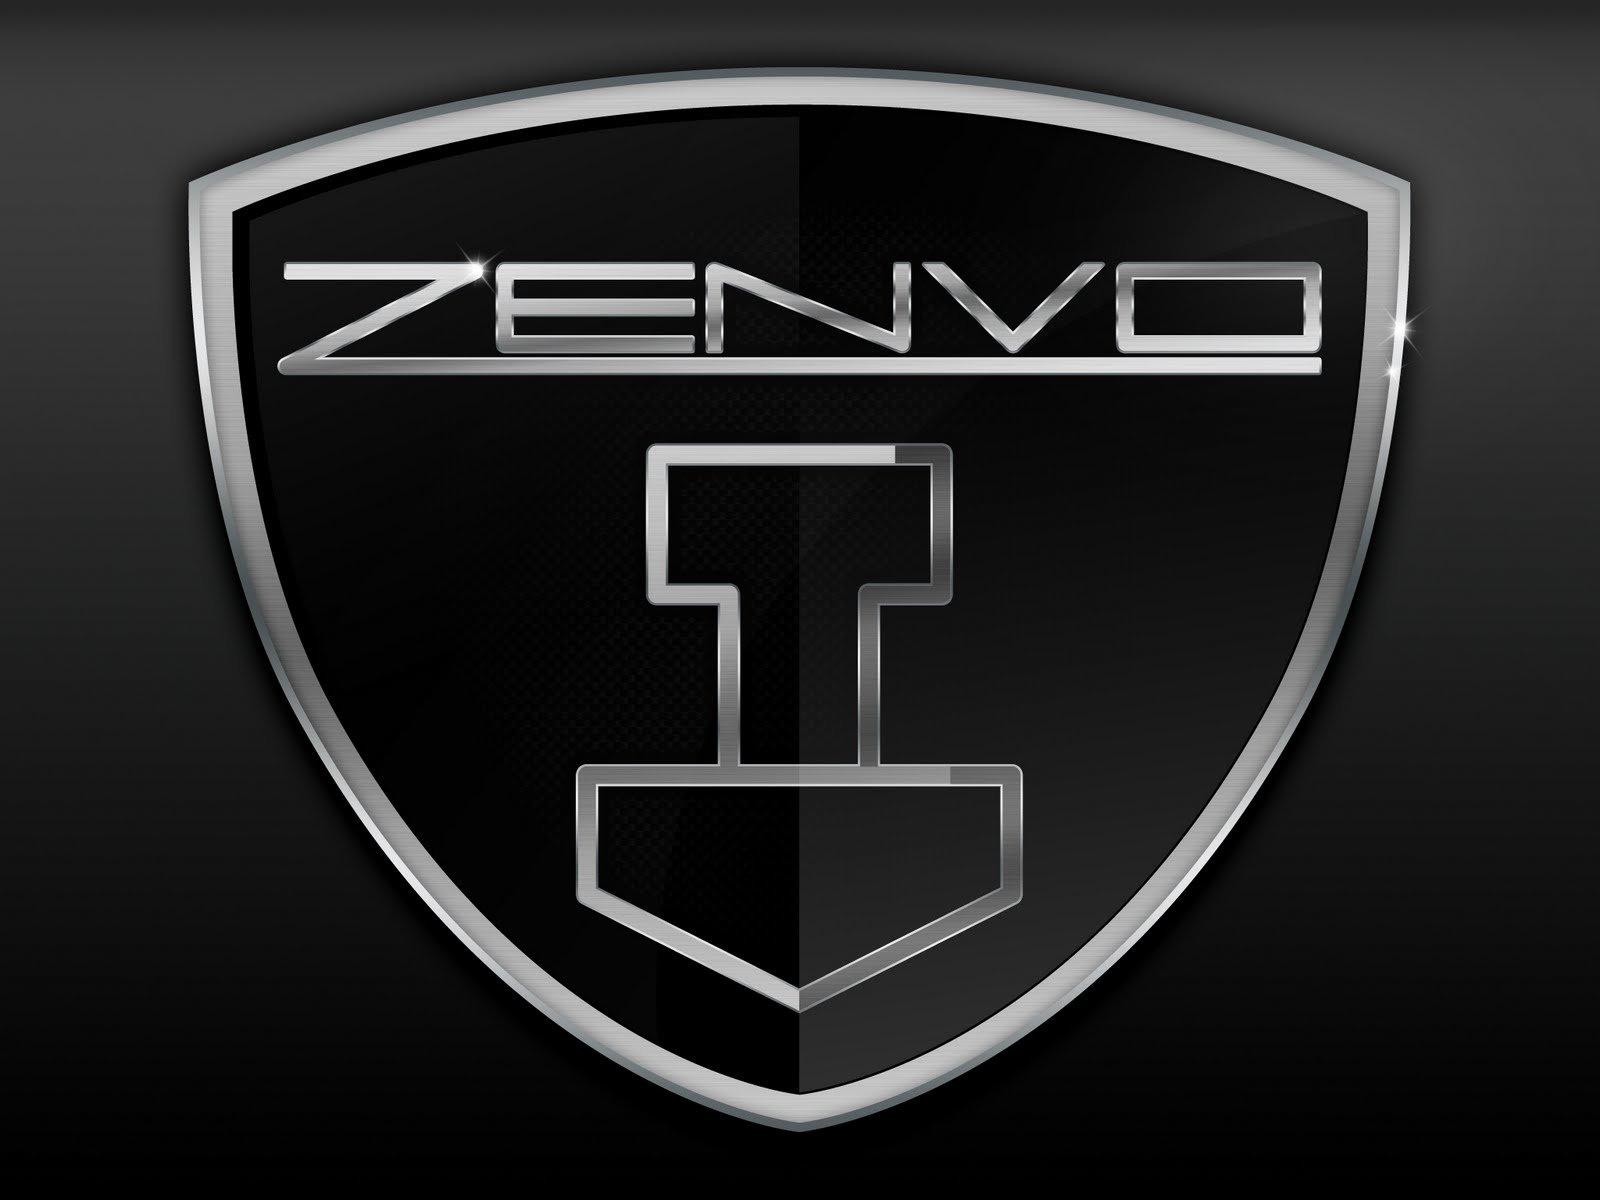 座驾 - Zenvo ST1  Logo Supercar Zenvo 壁纸